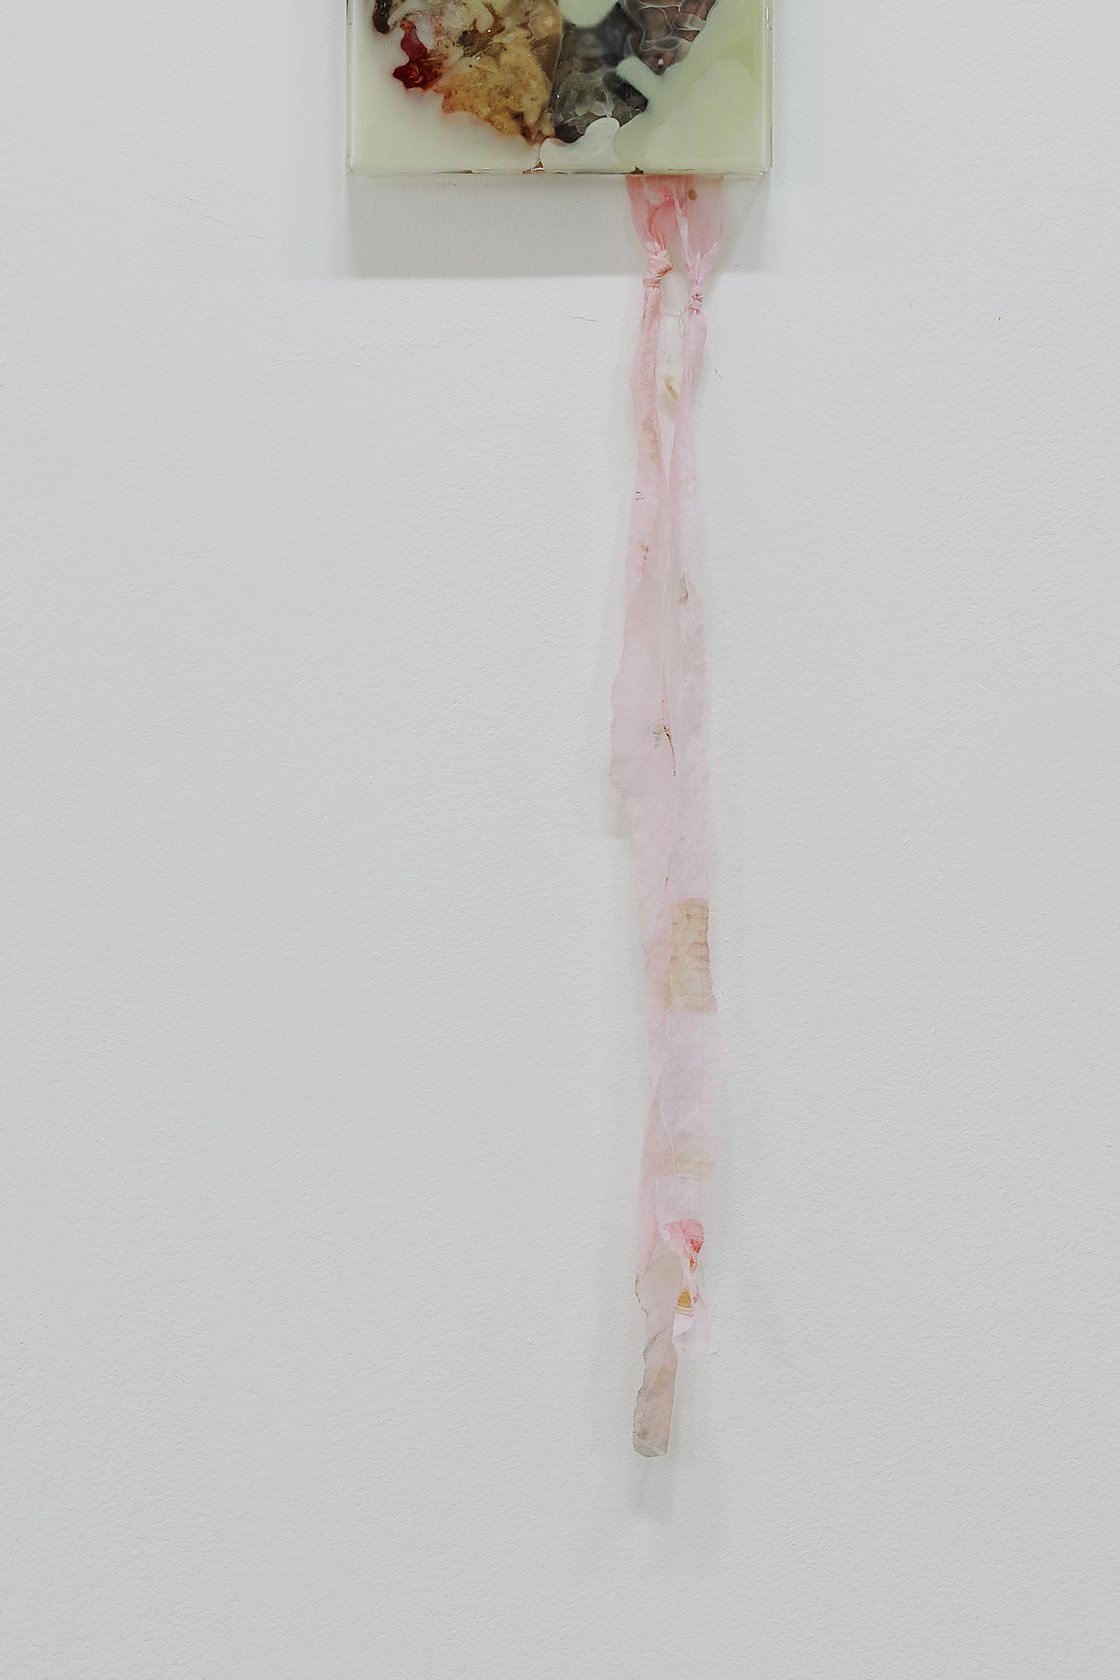 Mimosa Echard